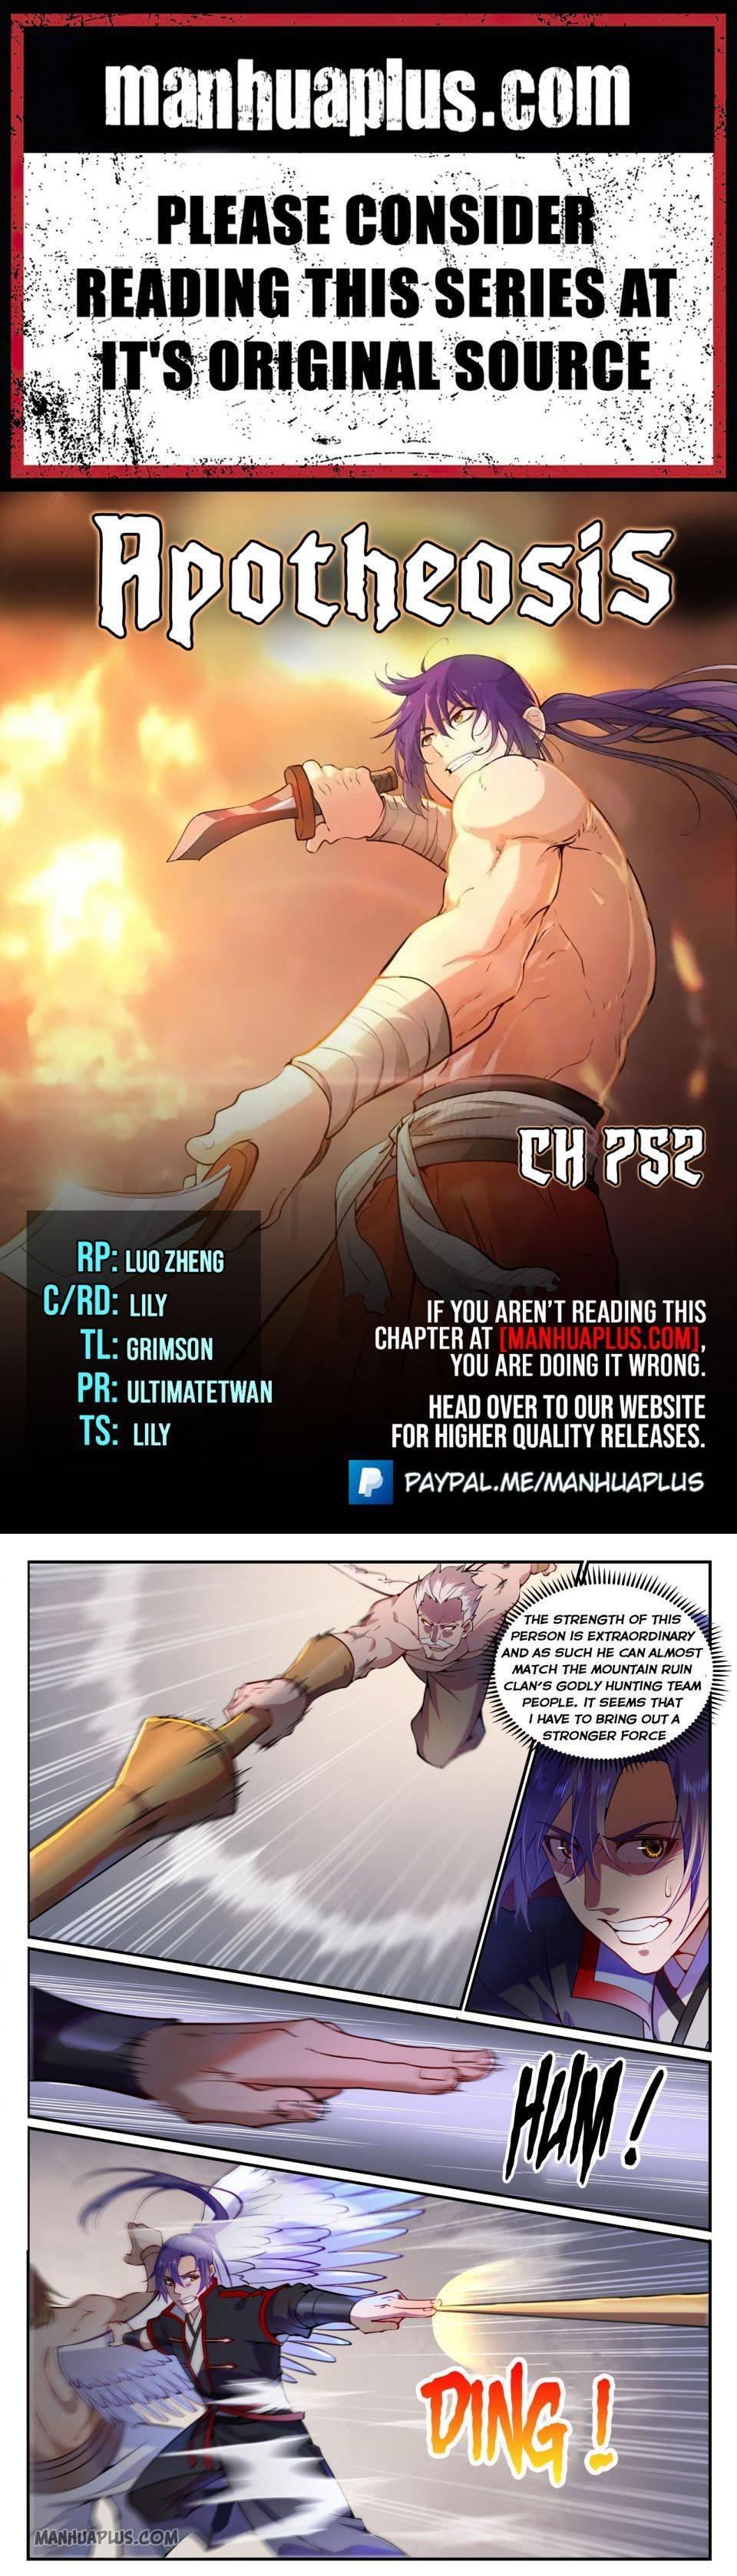 Manga Apotheosis - Chapter 752 Page 1